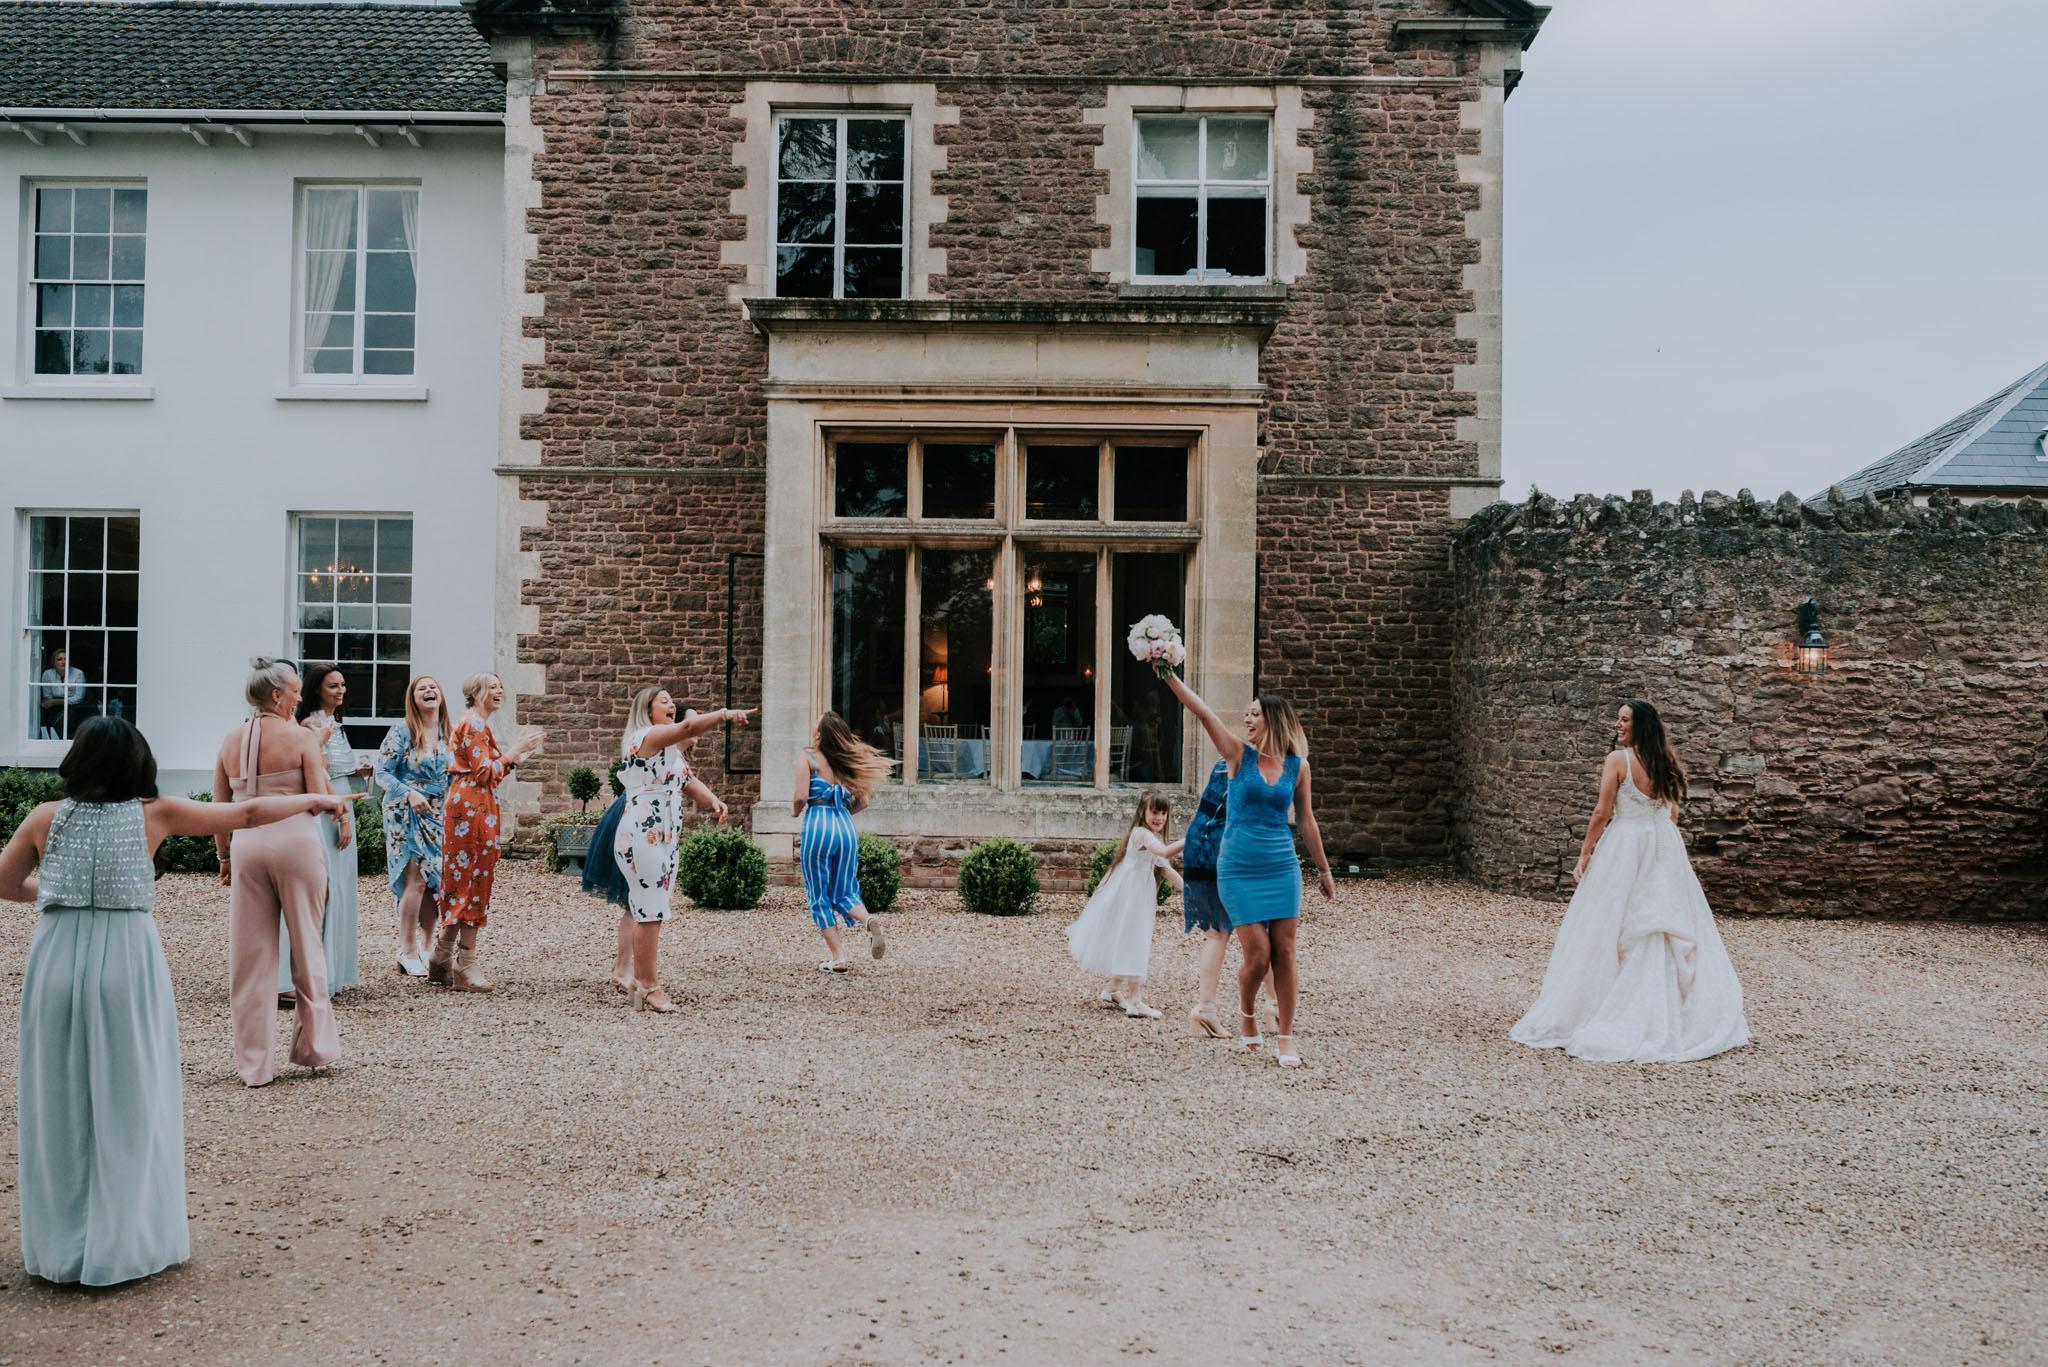 wedding-photographer-glewstone-court-hereford-scott-stockwell-photography467.jpg